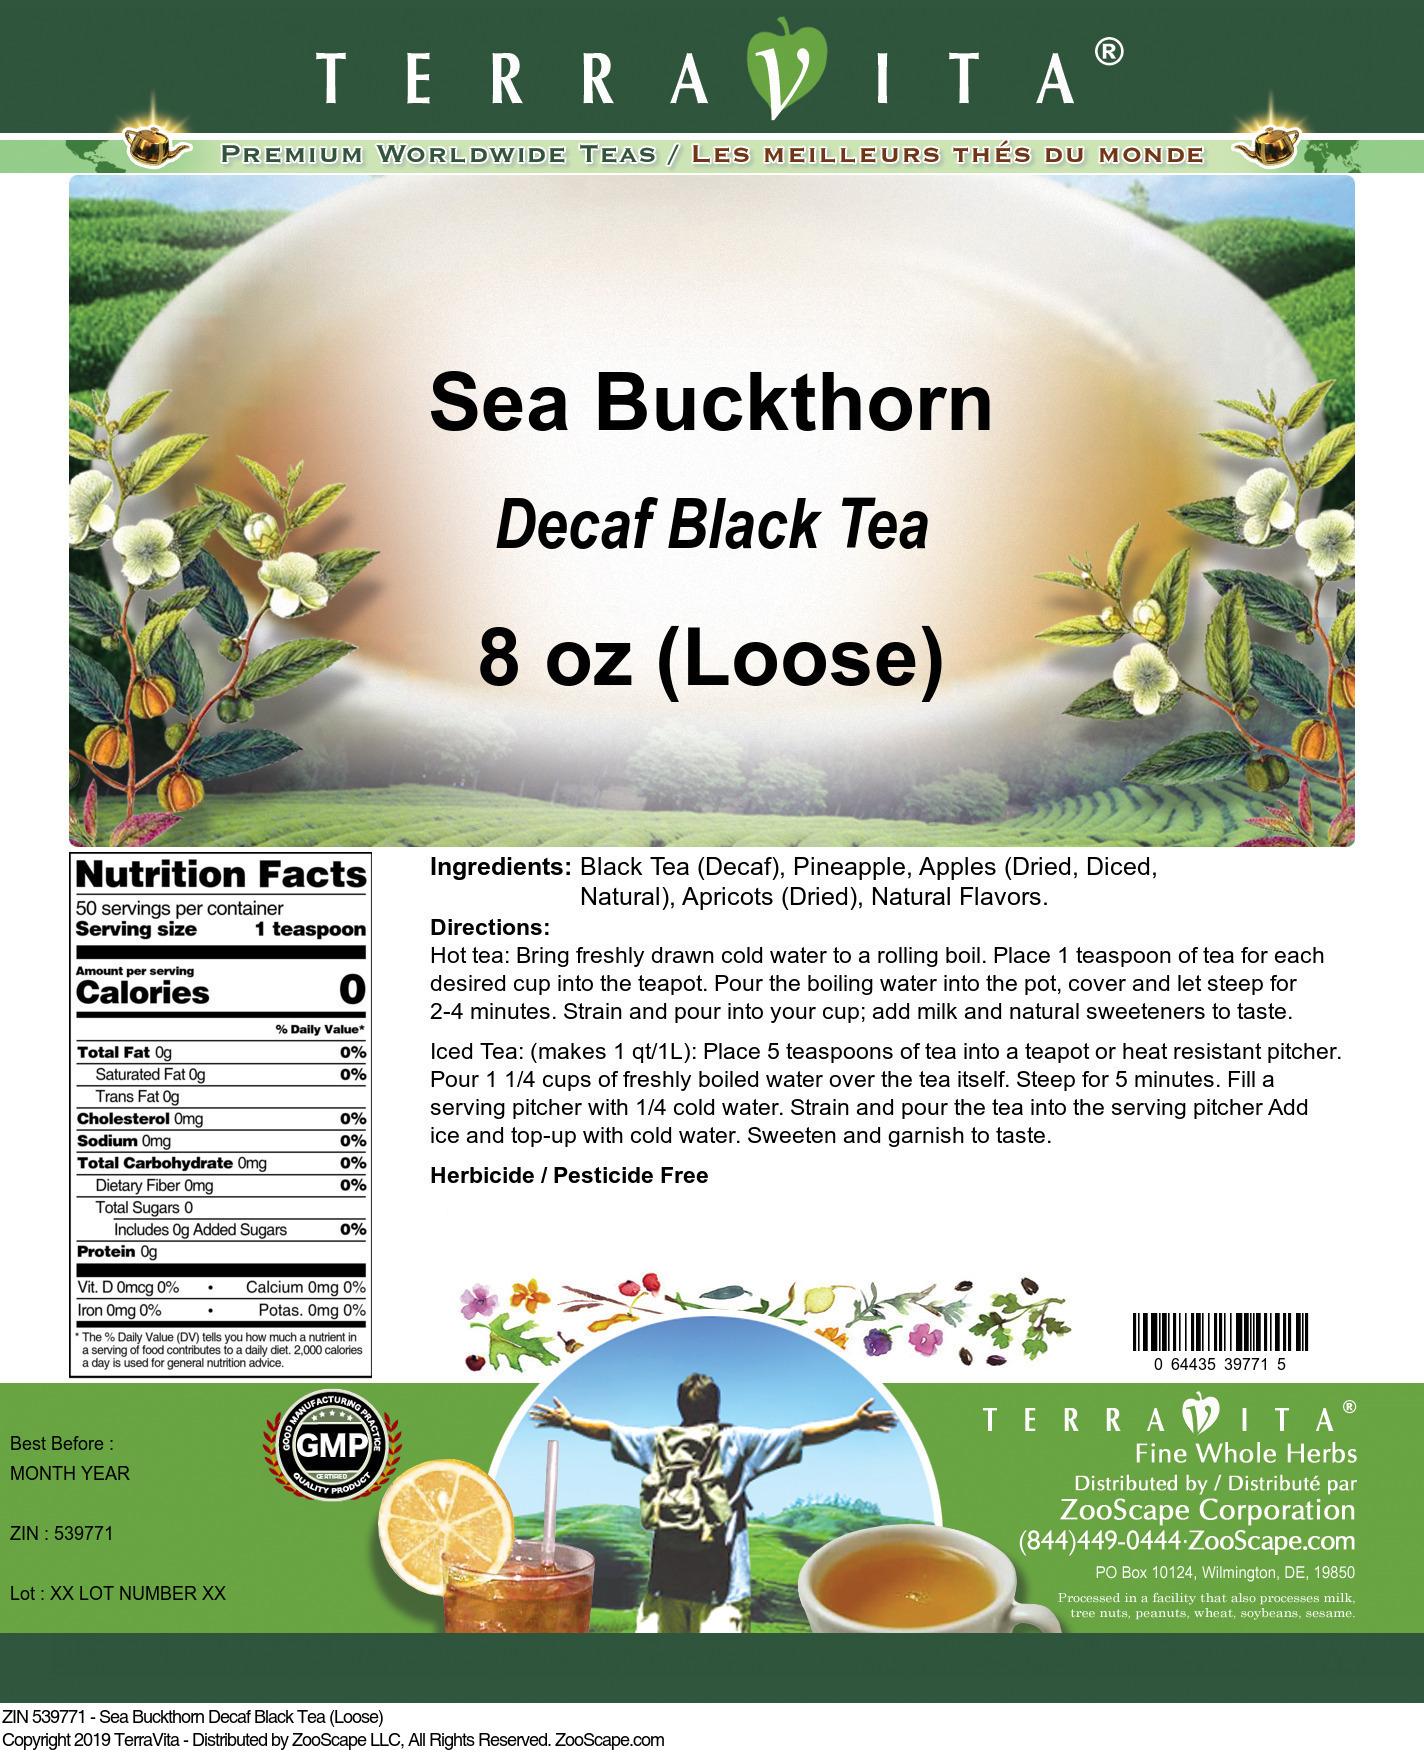 Sea Buckthorn Decaf Black Tea (Loose)